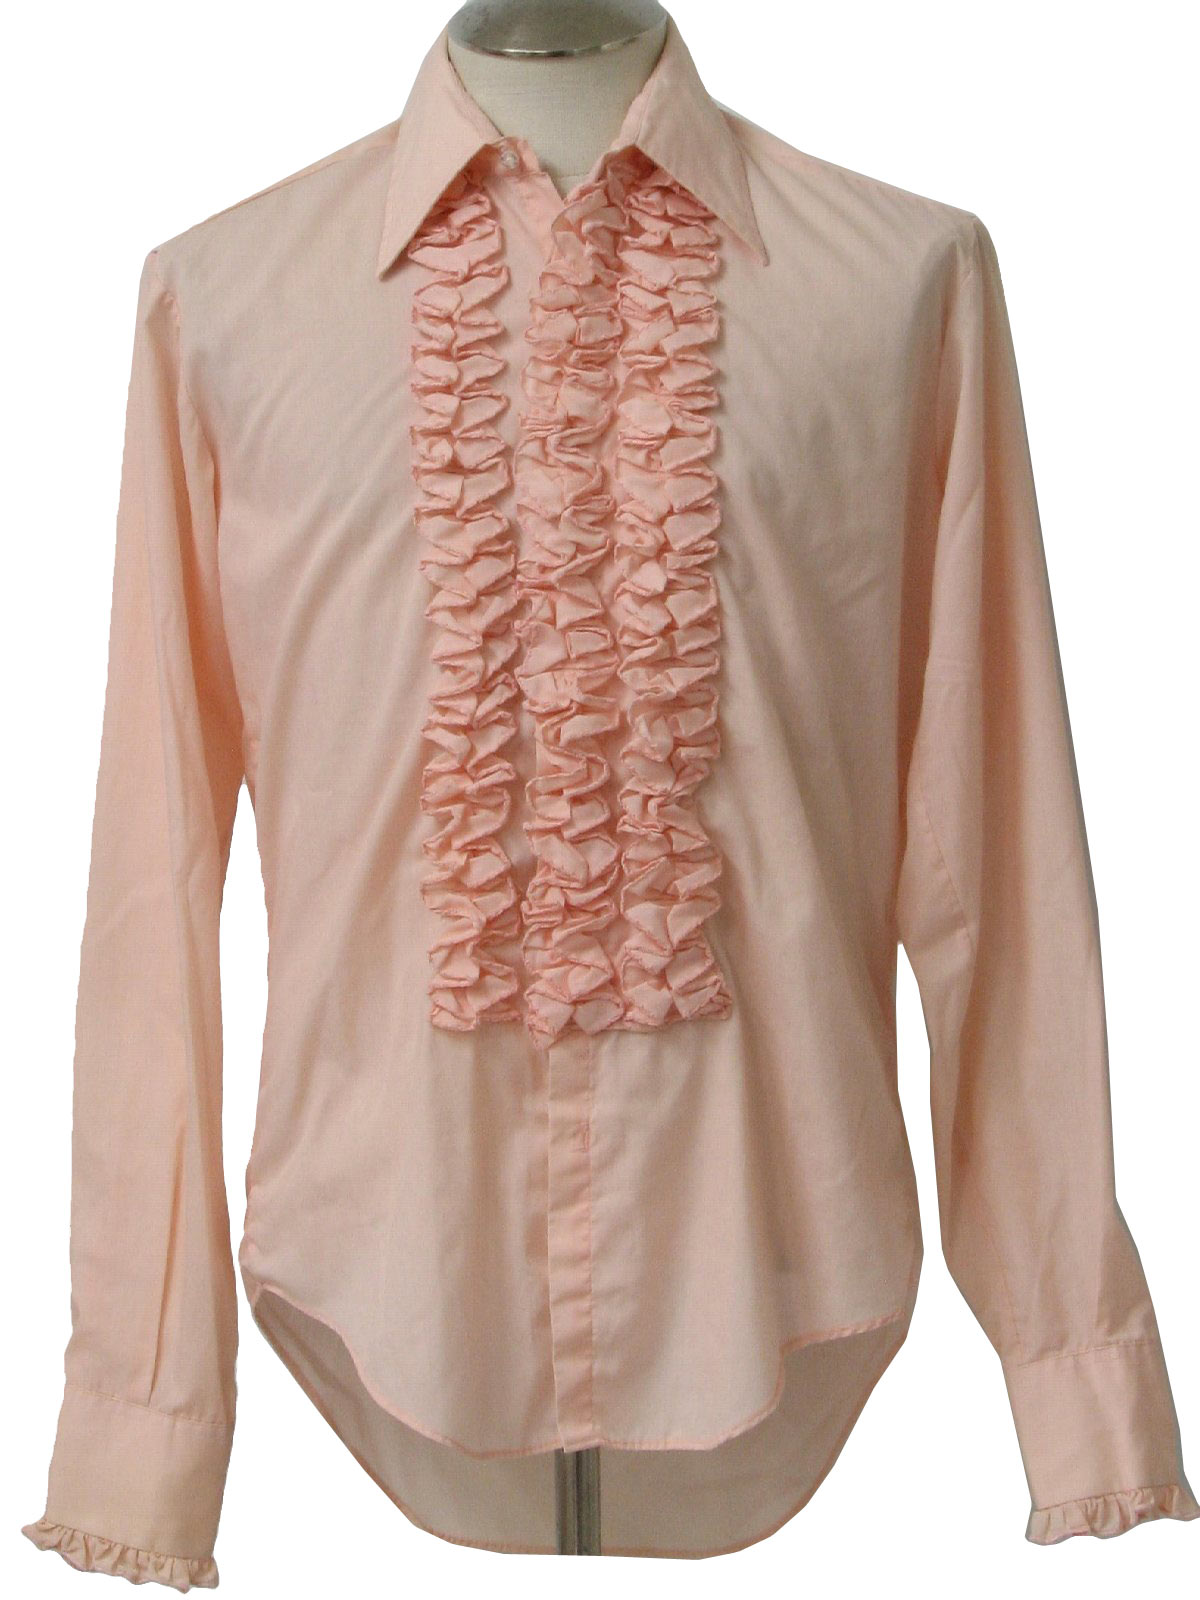 1980s tuxedo shirt